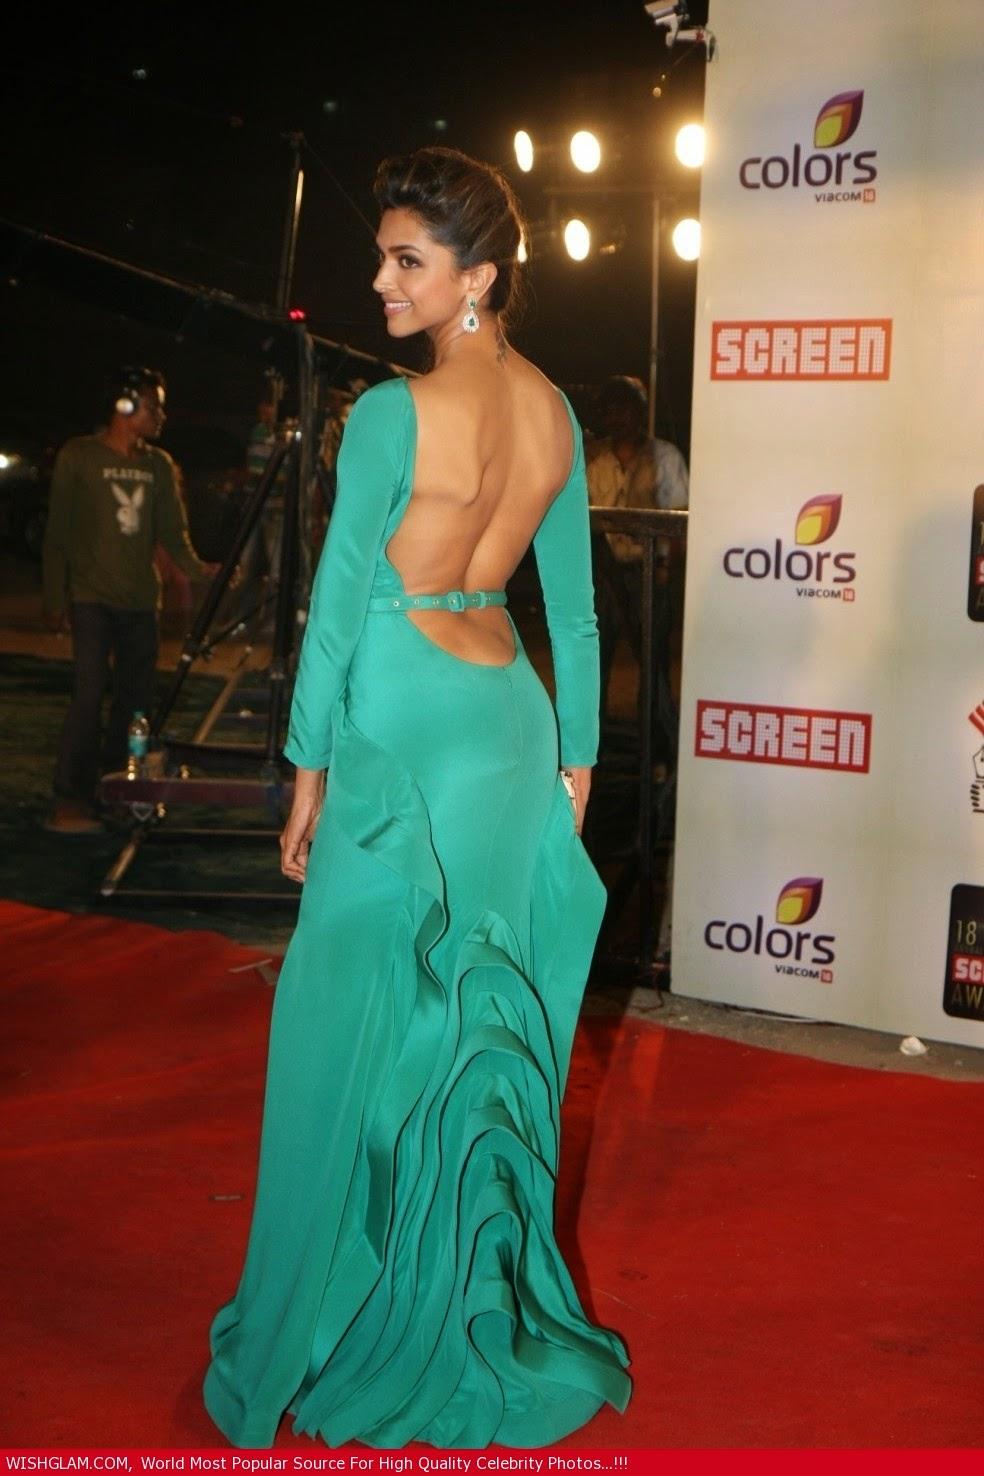 indian actress butt